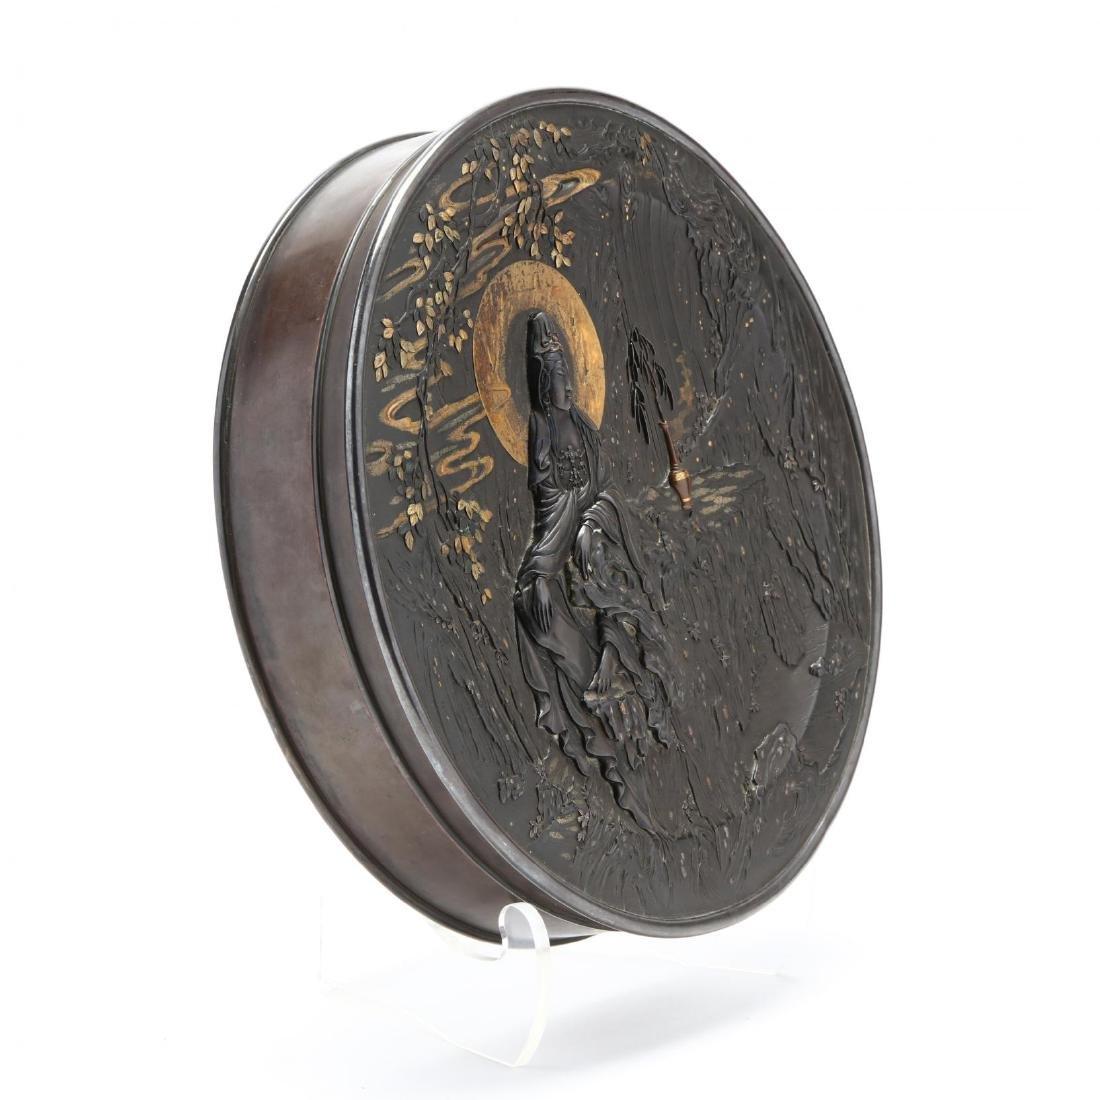 A Bronze and Mixed Metals Circular Box with Bodhisattva - 2